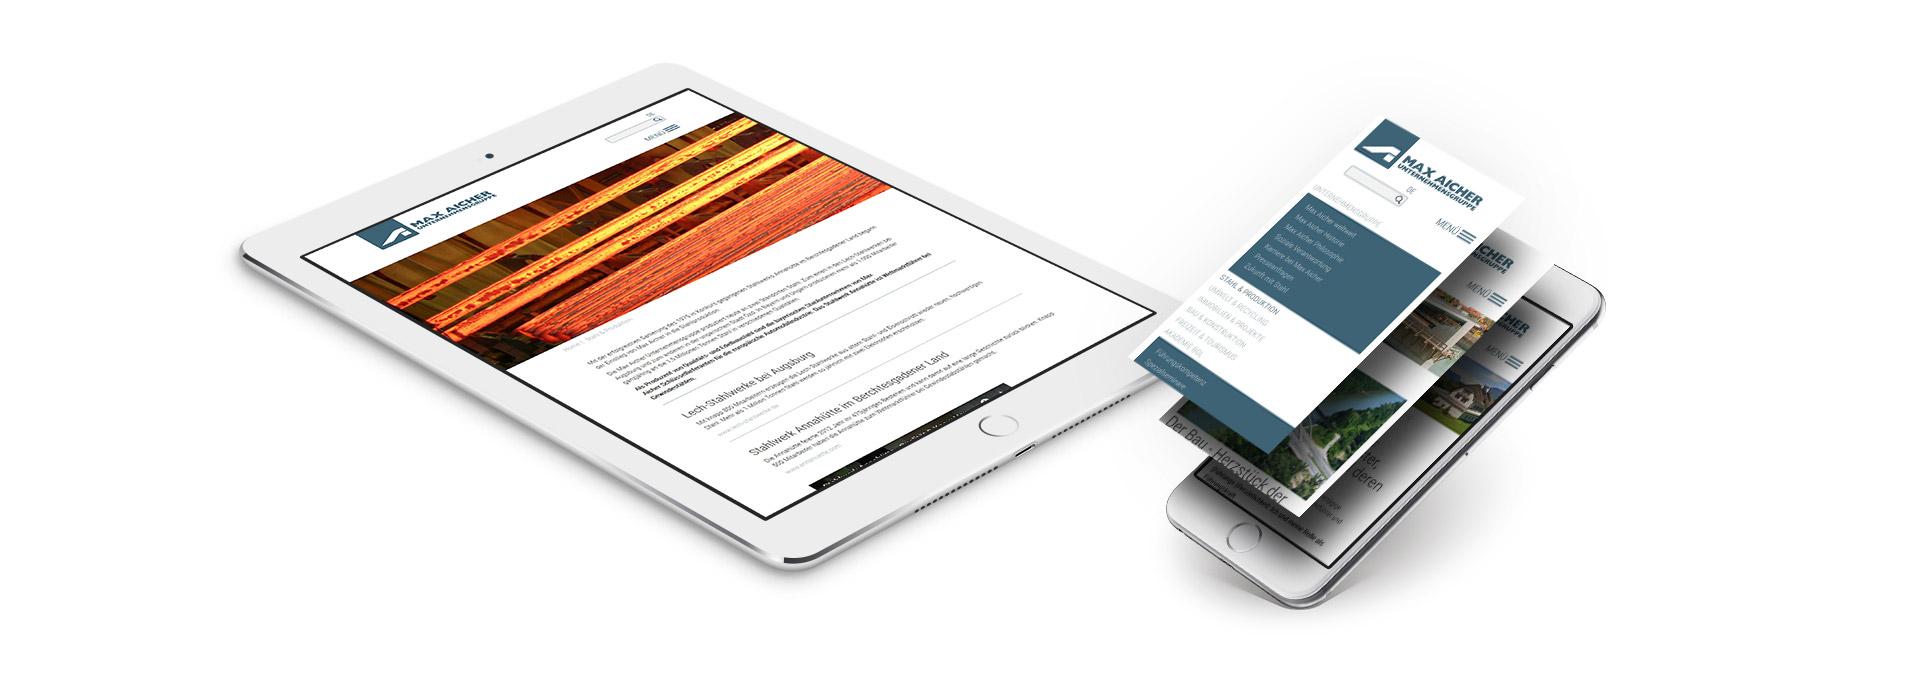 Bi Max Aicher Tablet Handy